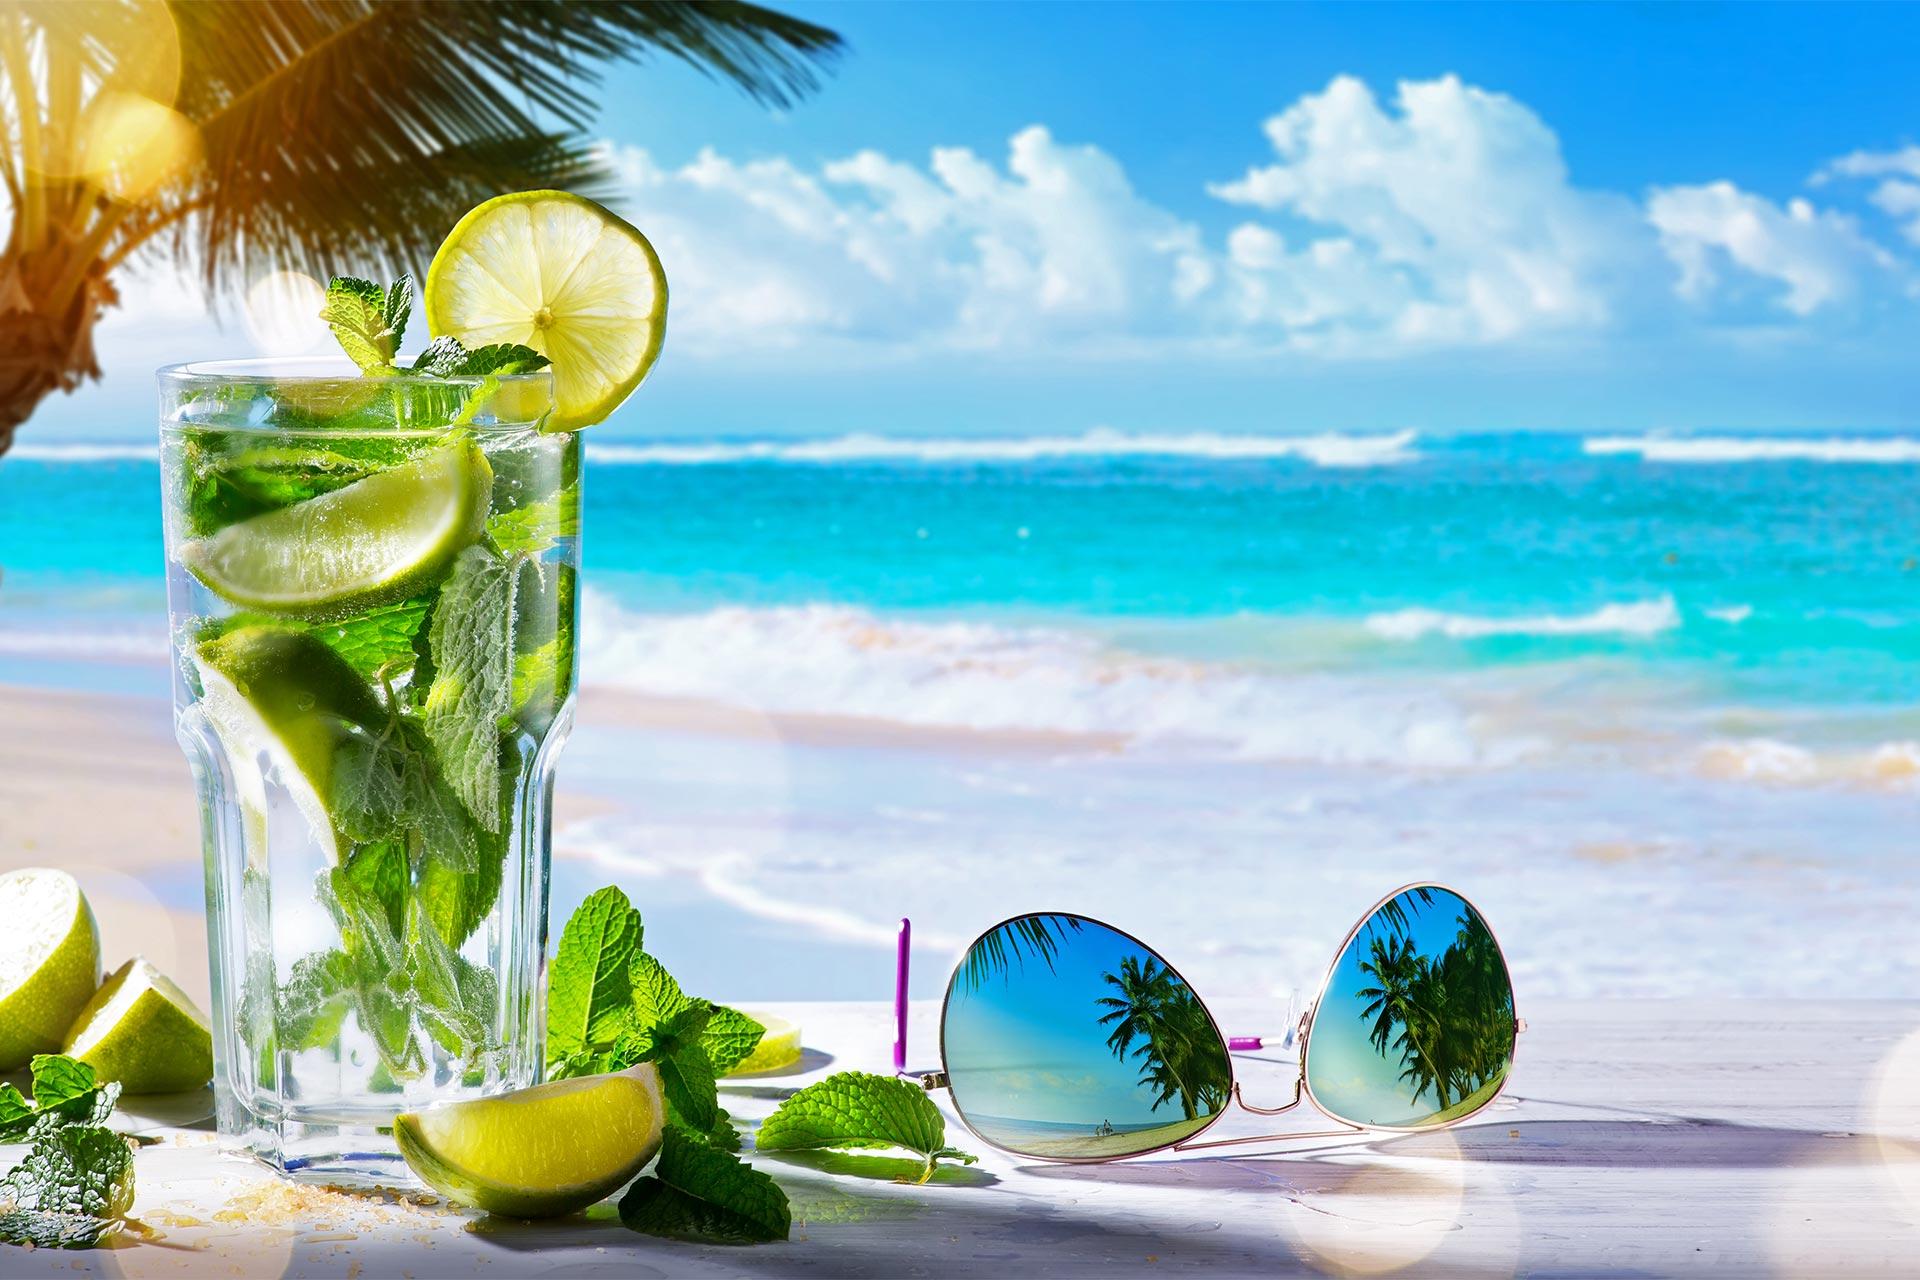 Sejur Cancun si plaja Riviera Maya, Mexic, 11 zile - ianuarie 2022